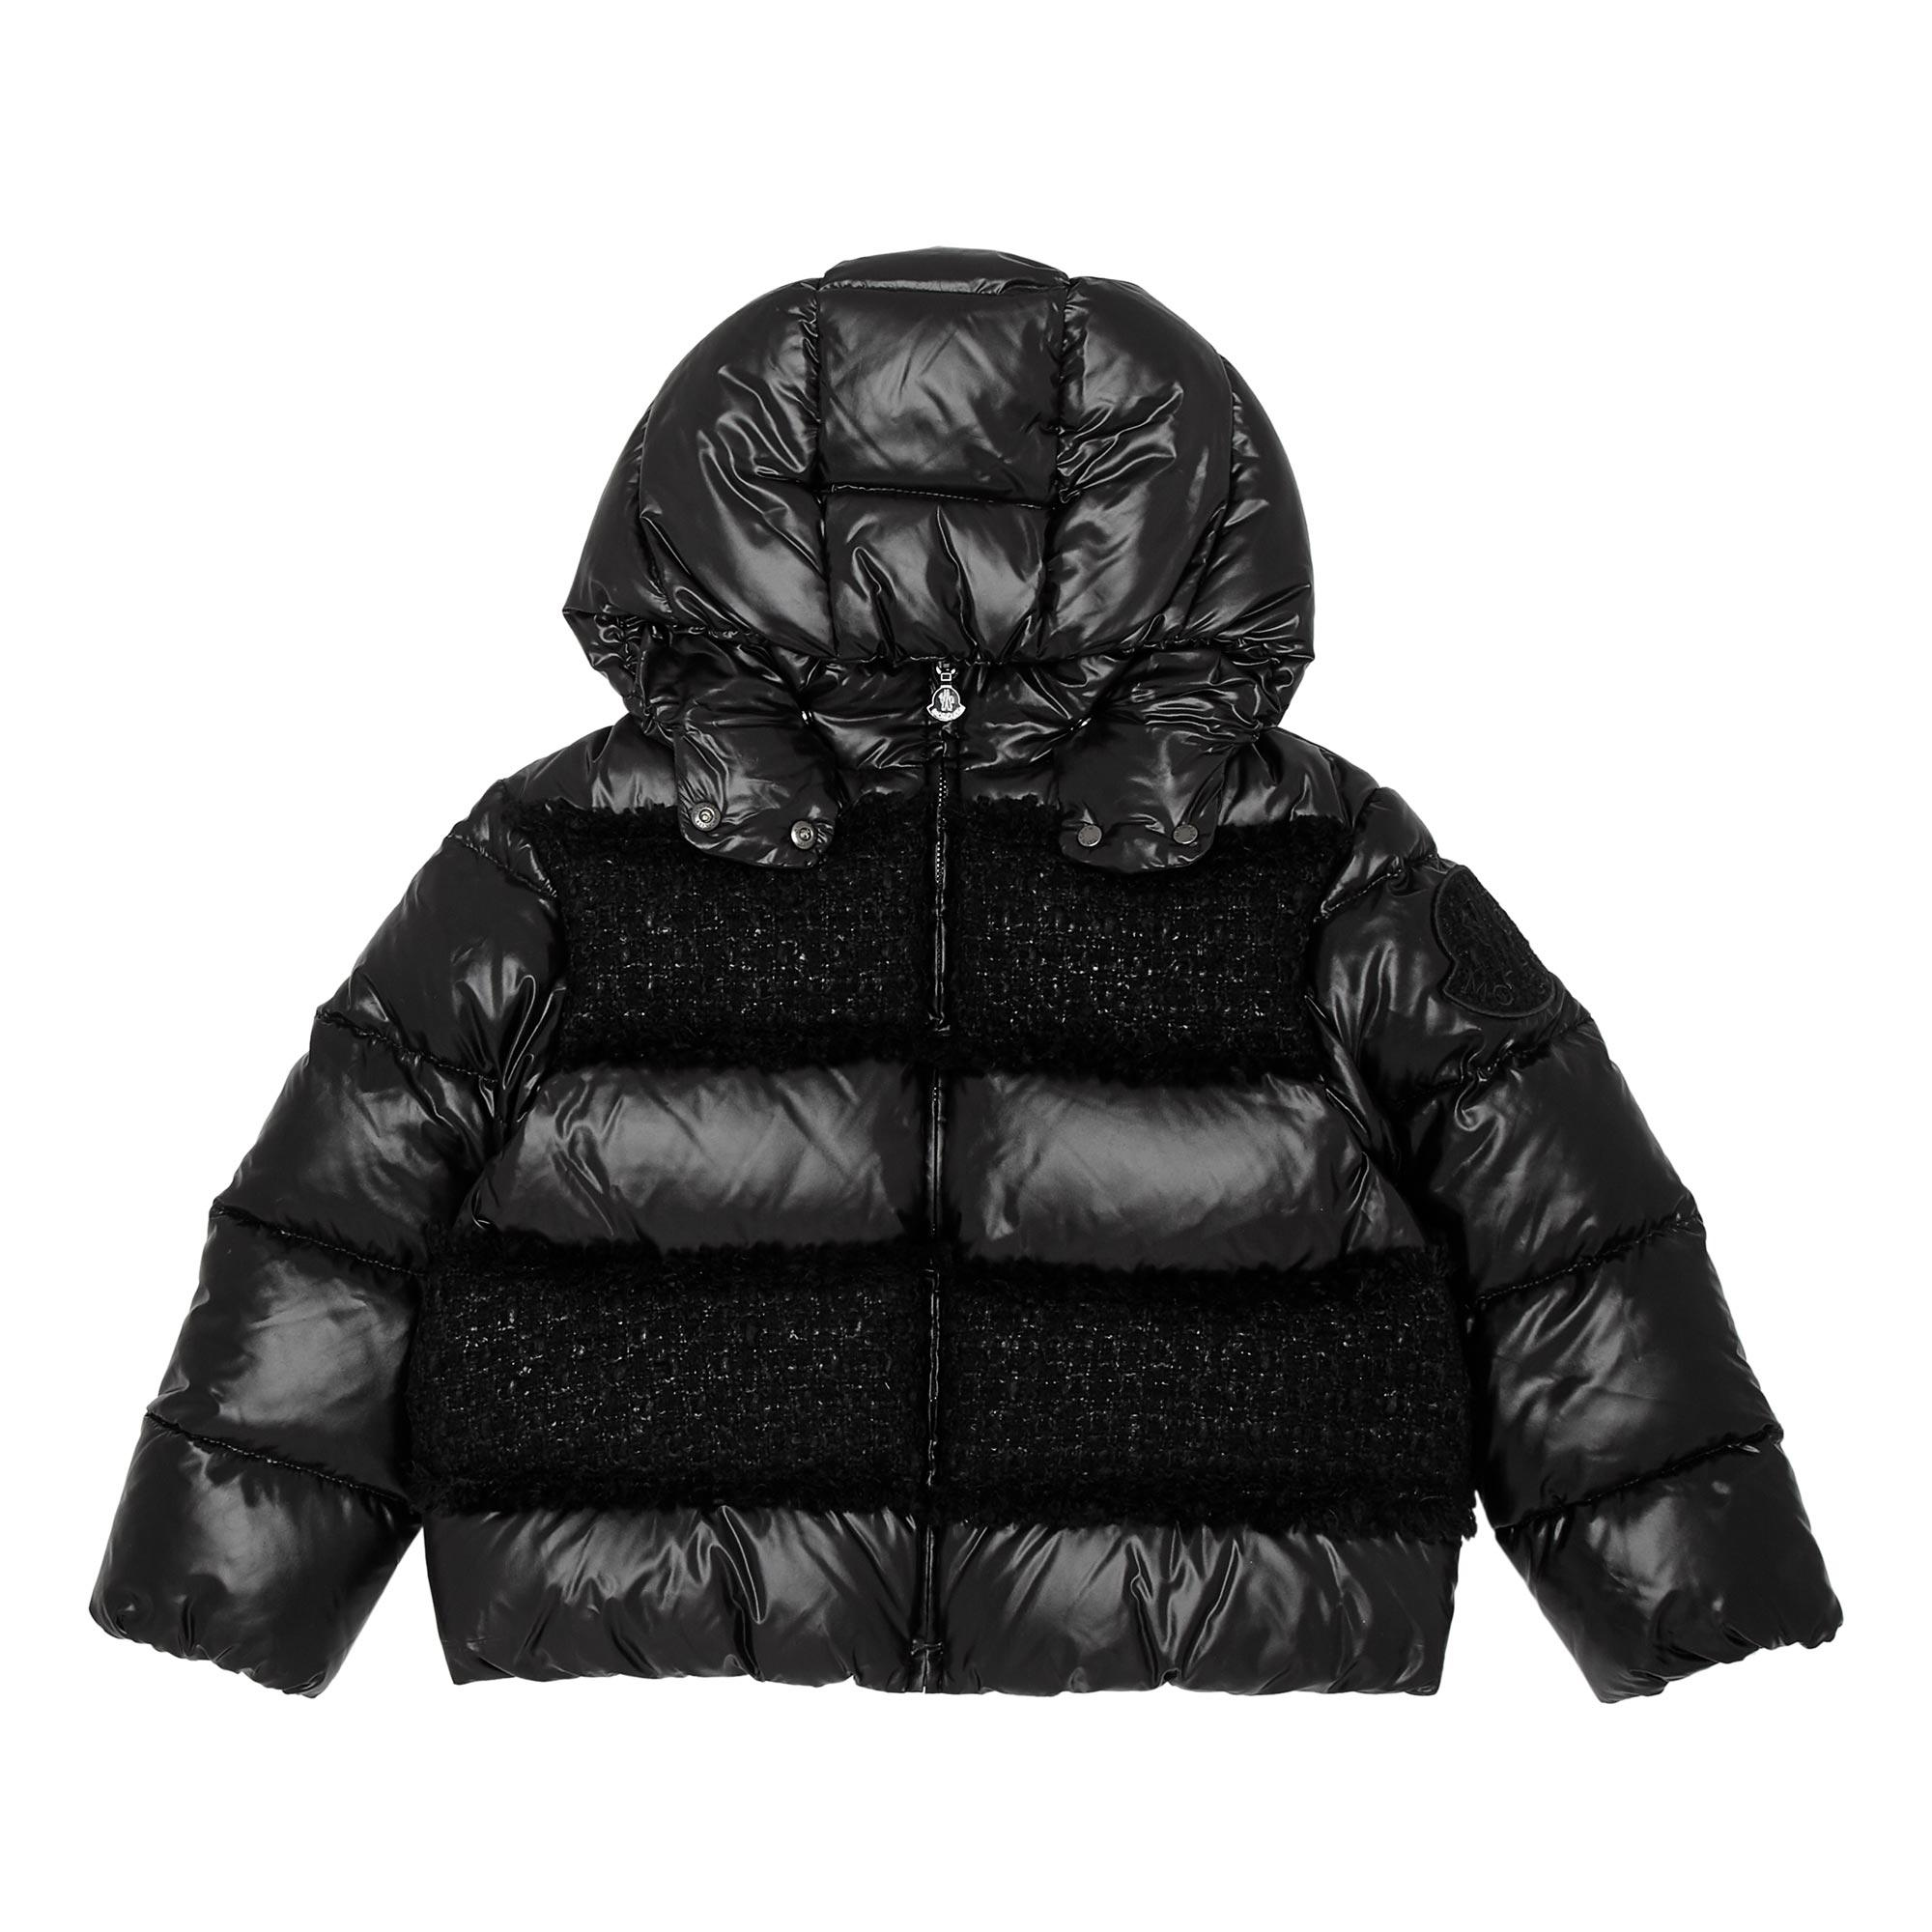 Elbe Coat